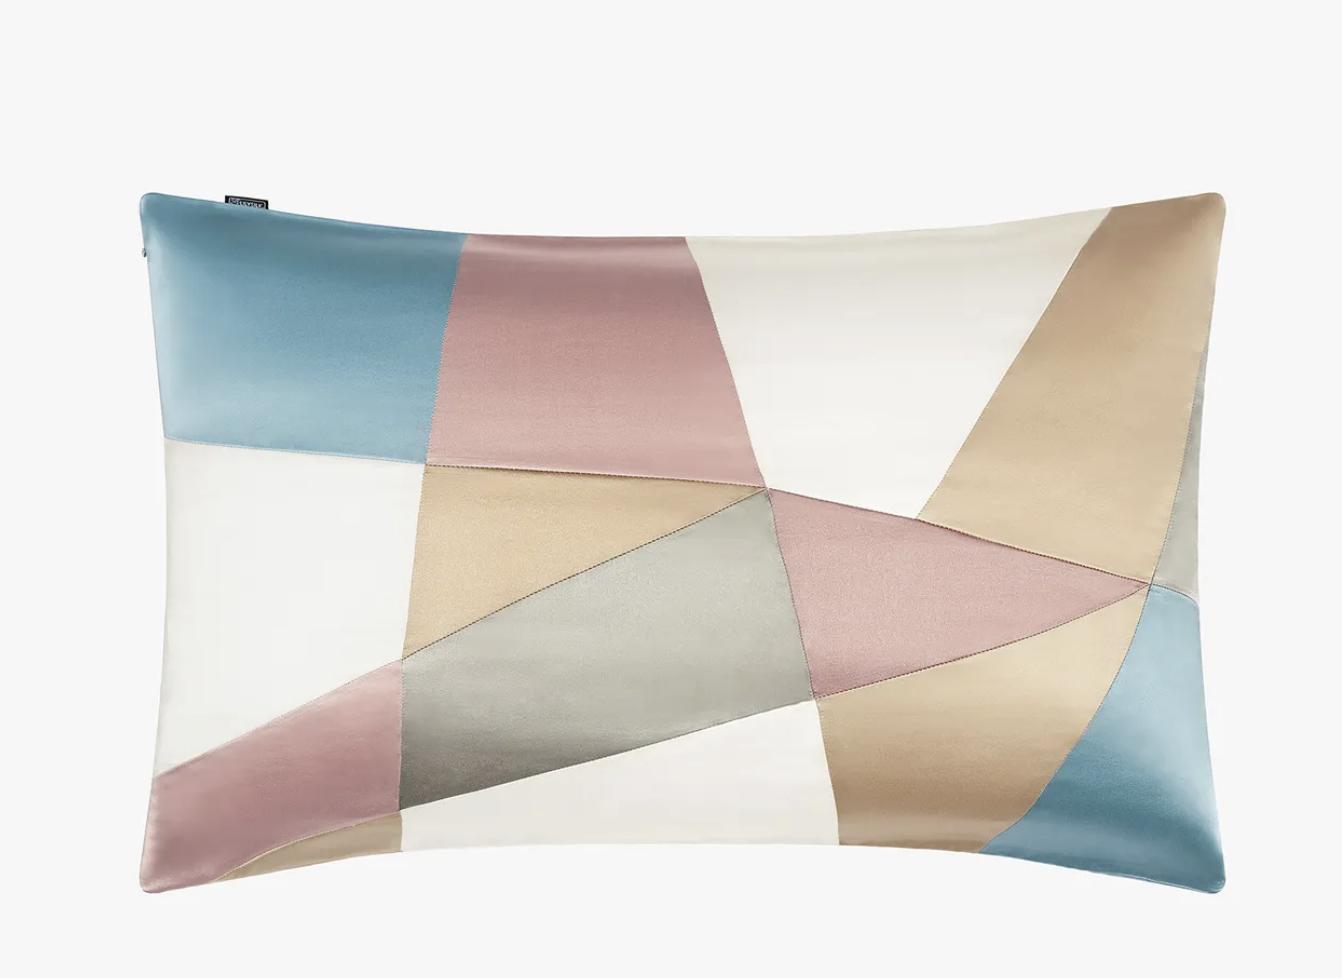 Lilysilk:Buy One, Get One 40% off Re-LILYSILK Pillowcase